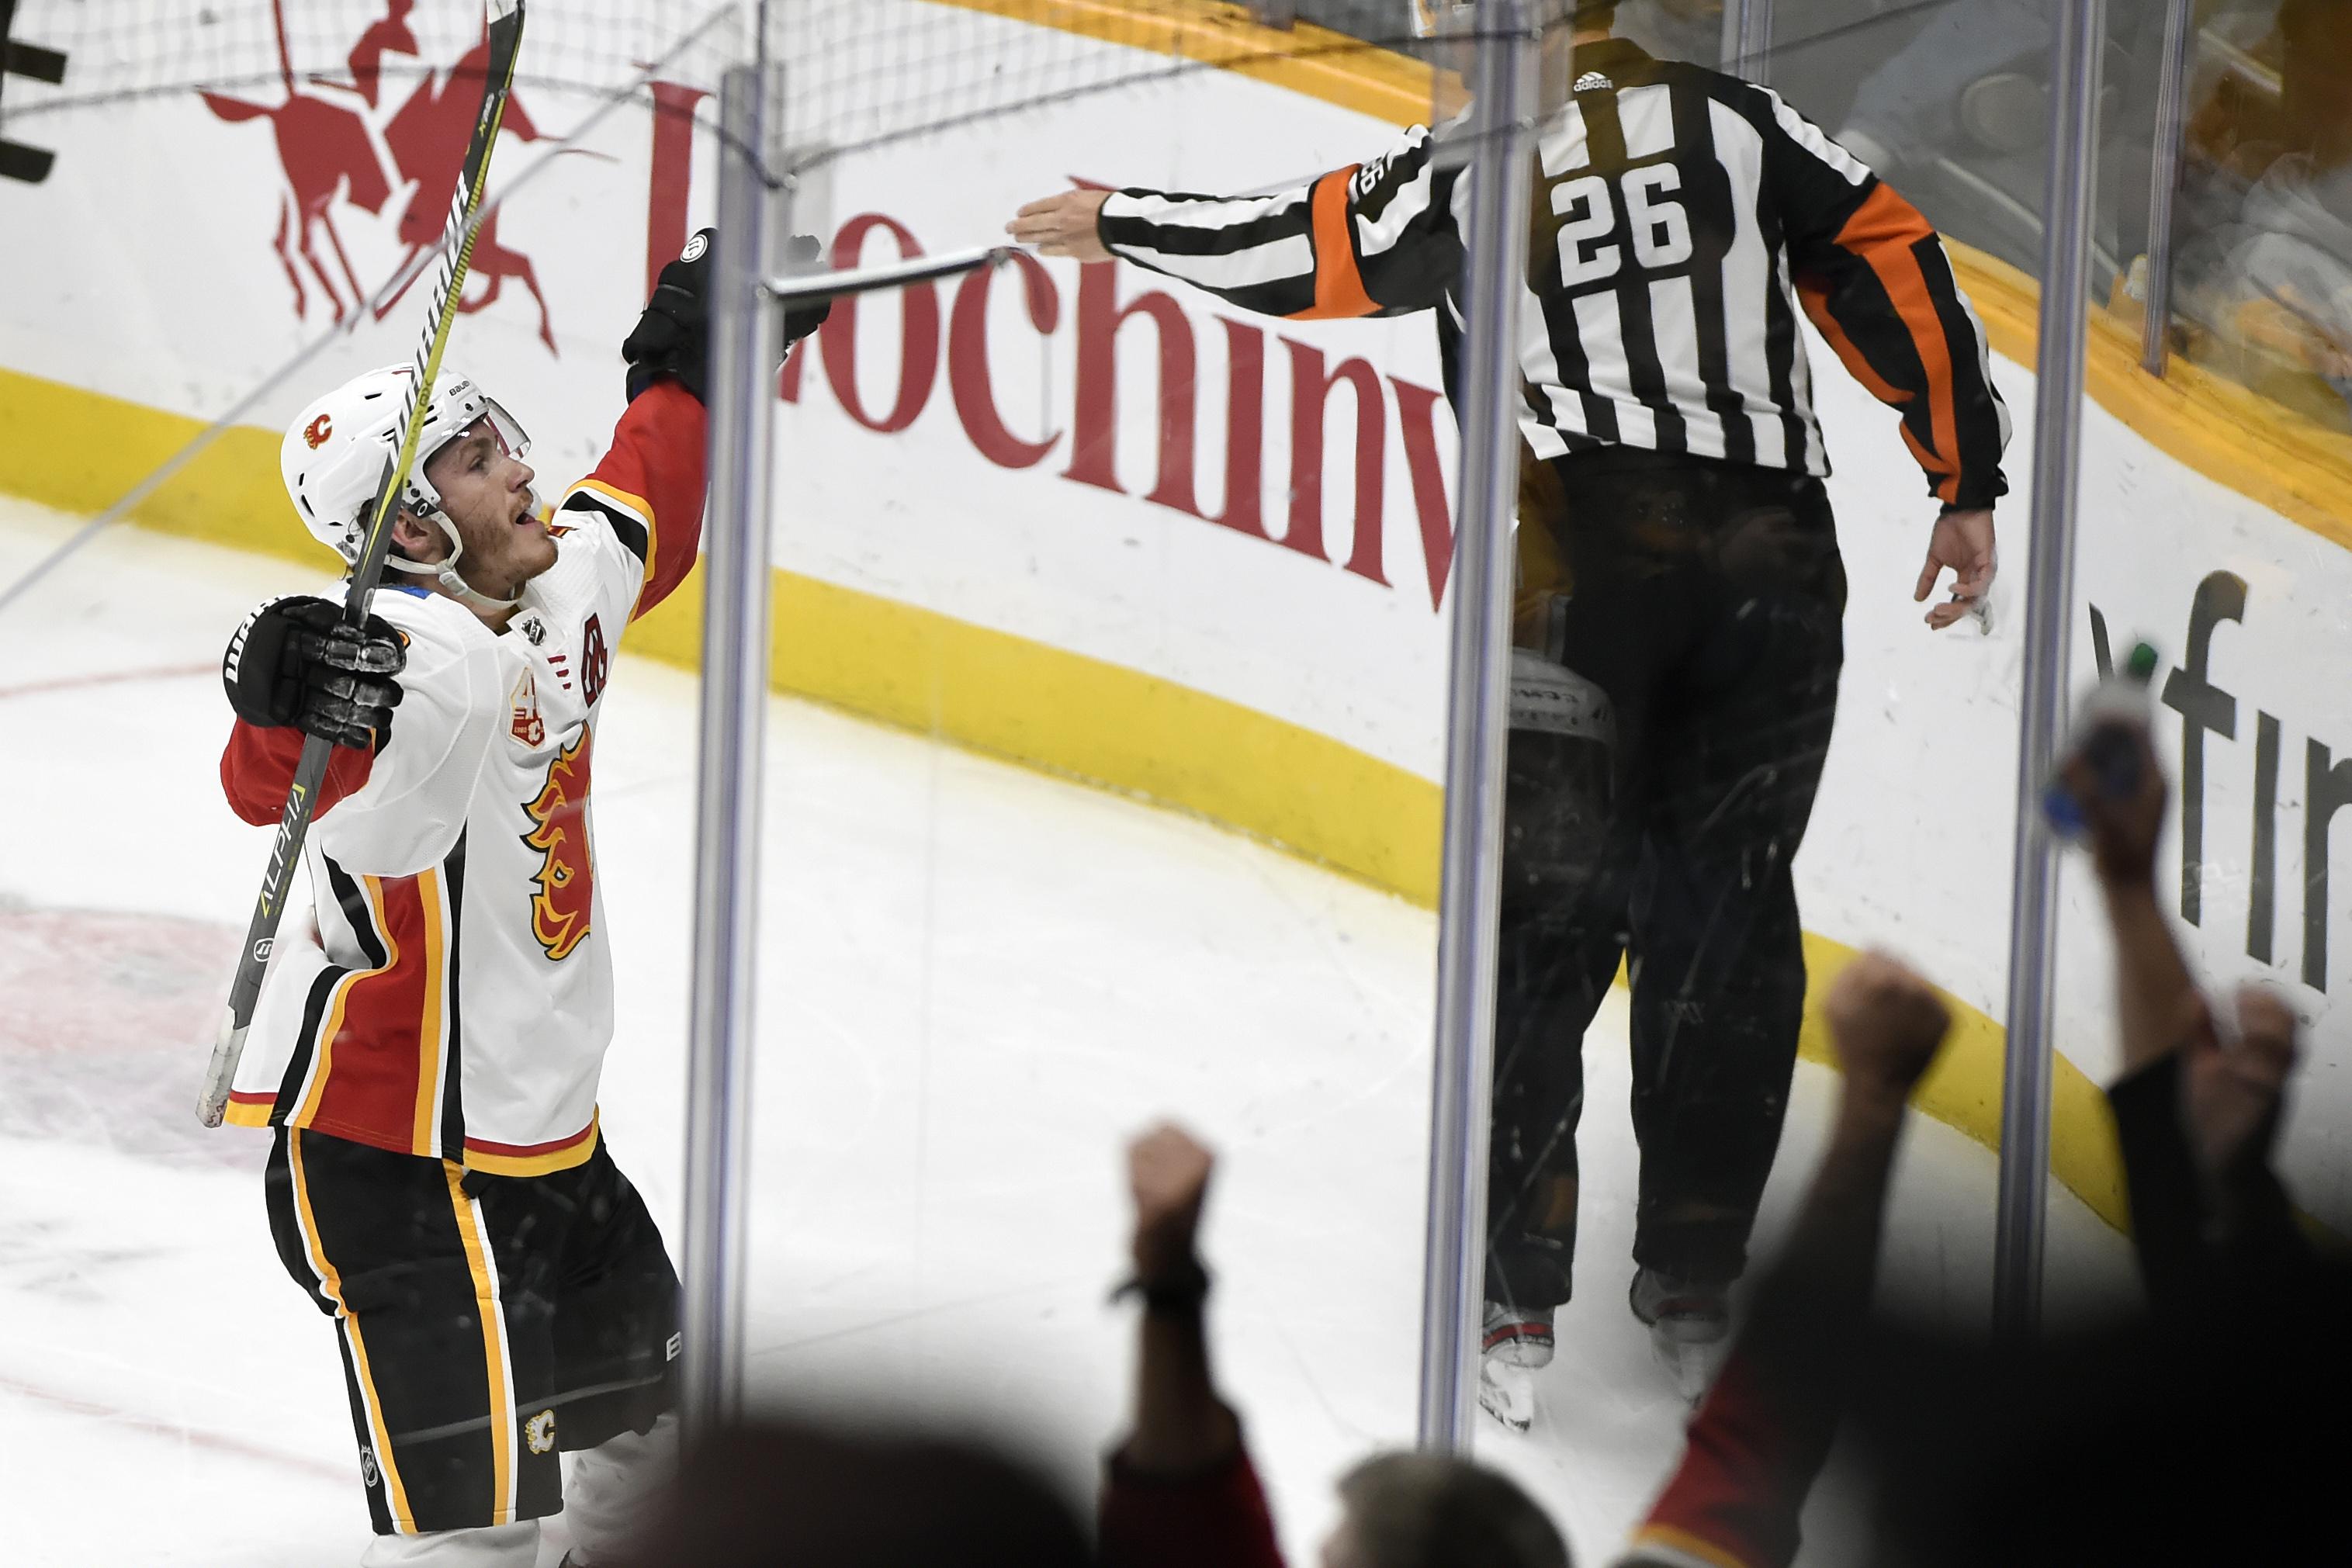 Tkachuk scores tying, winning goals, Flames top Predators